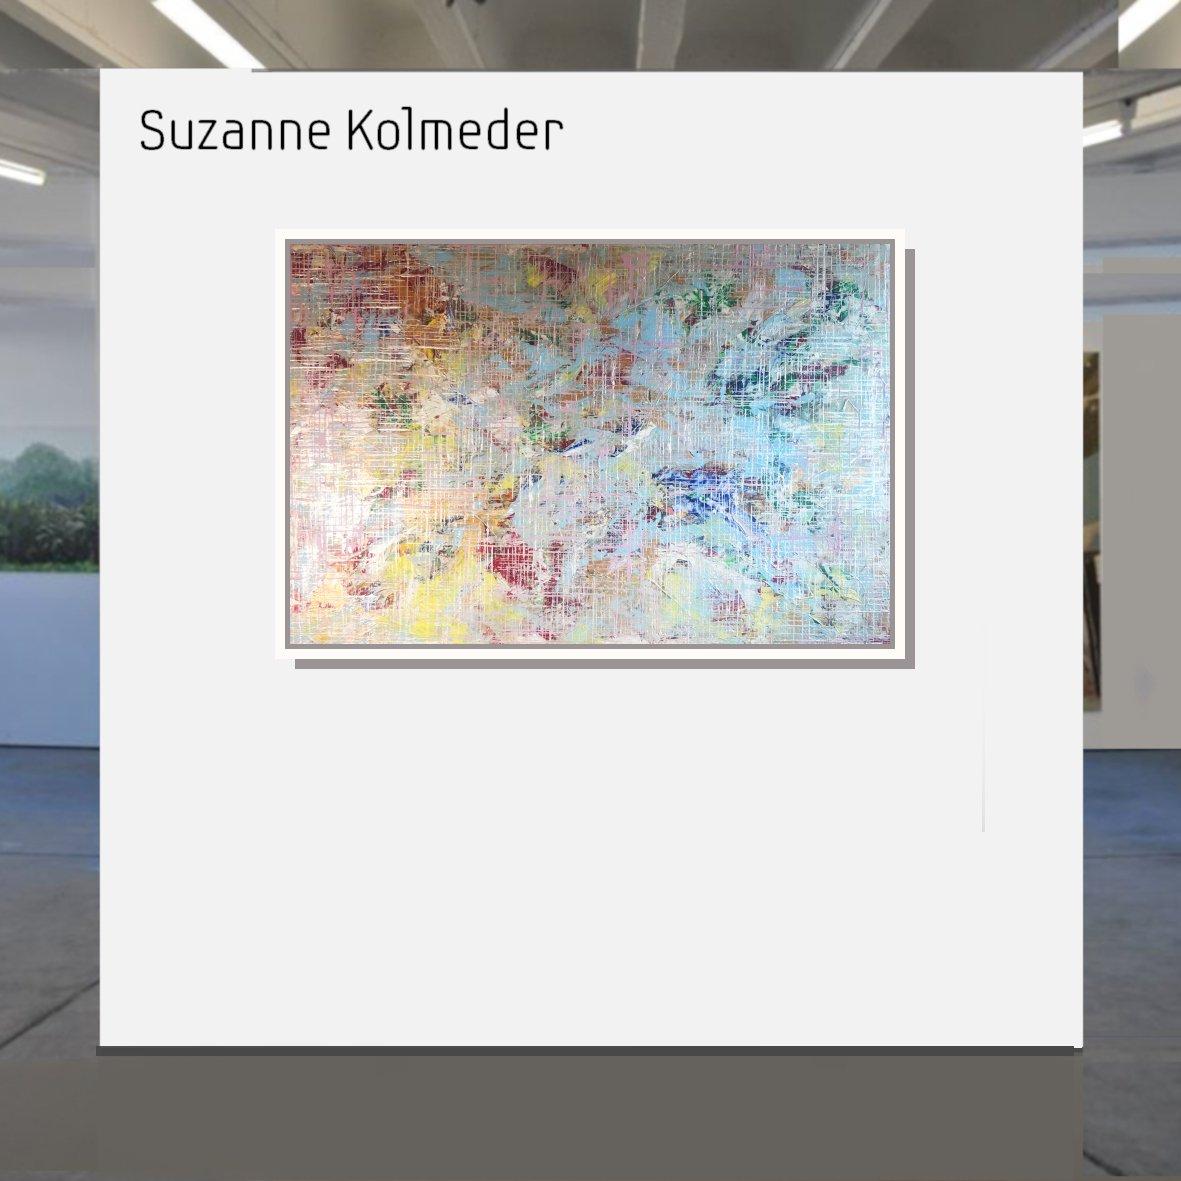 Maske_Suzanne_Kolmeder_Networks._VISION_No.1_2020_80_x_120_cm_mit_Rahmen